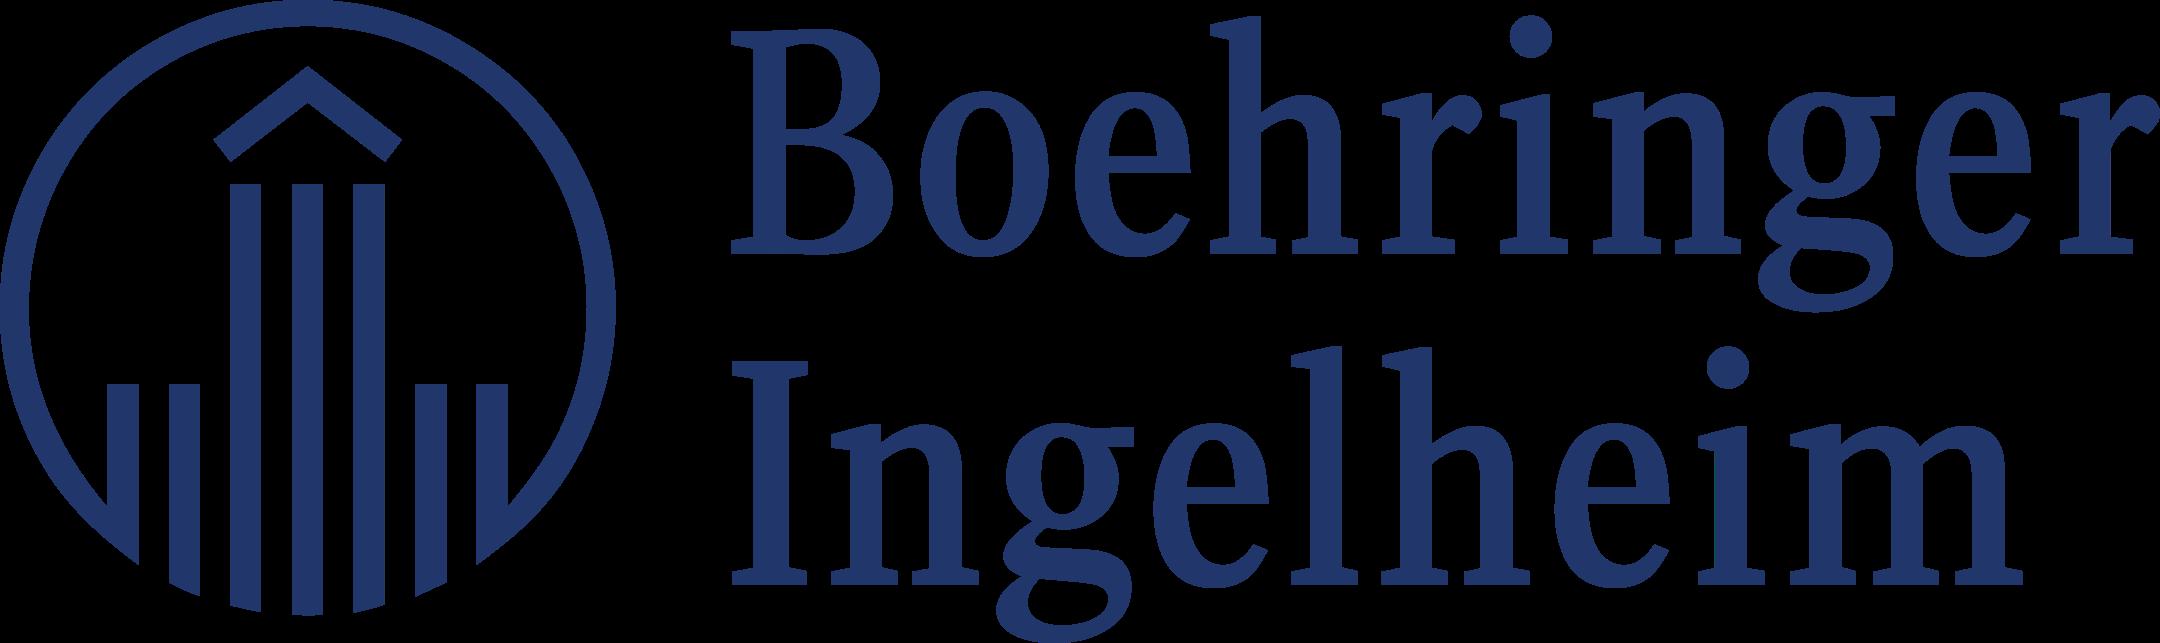 boehringer ingelheim logo 1 - Boehringer Ingelheim Logo